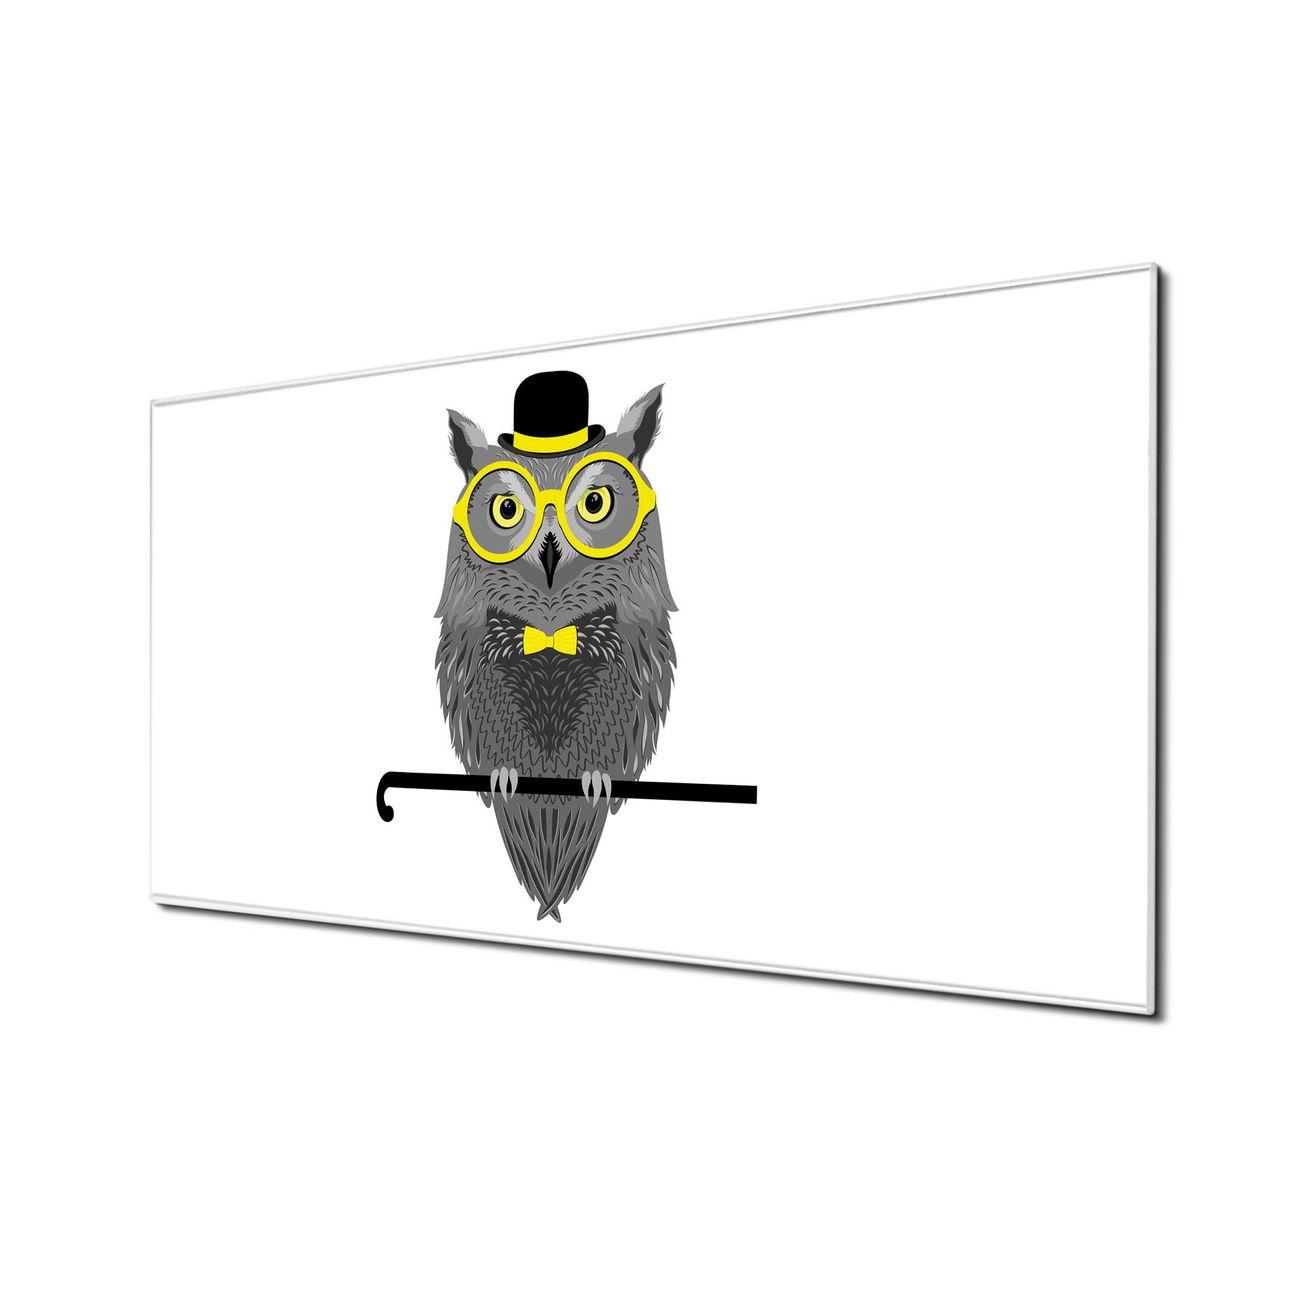 Küchenrückwand Glas Motiv Owling